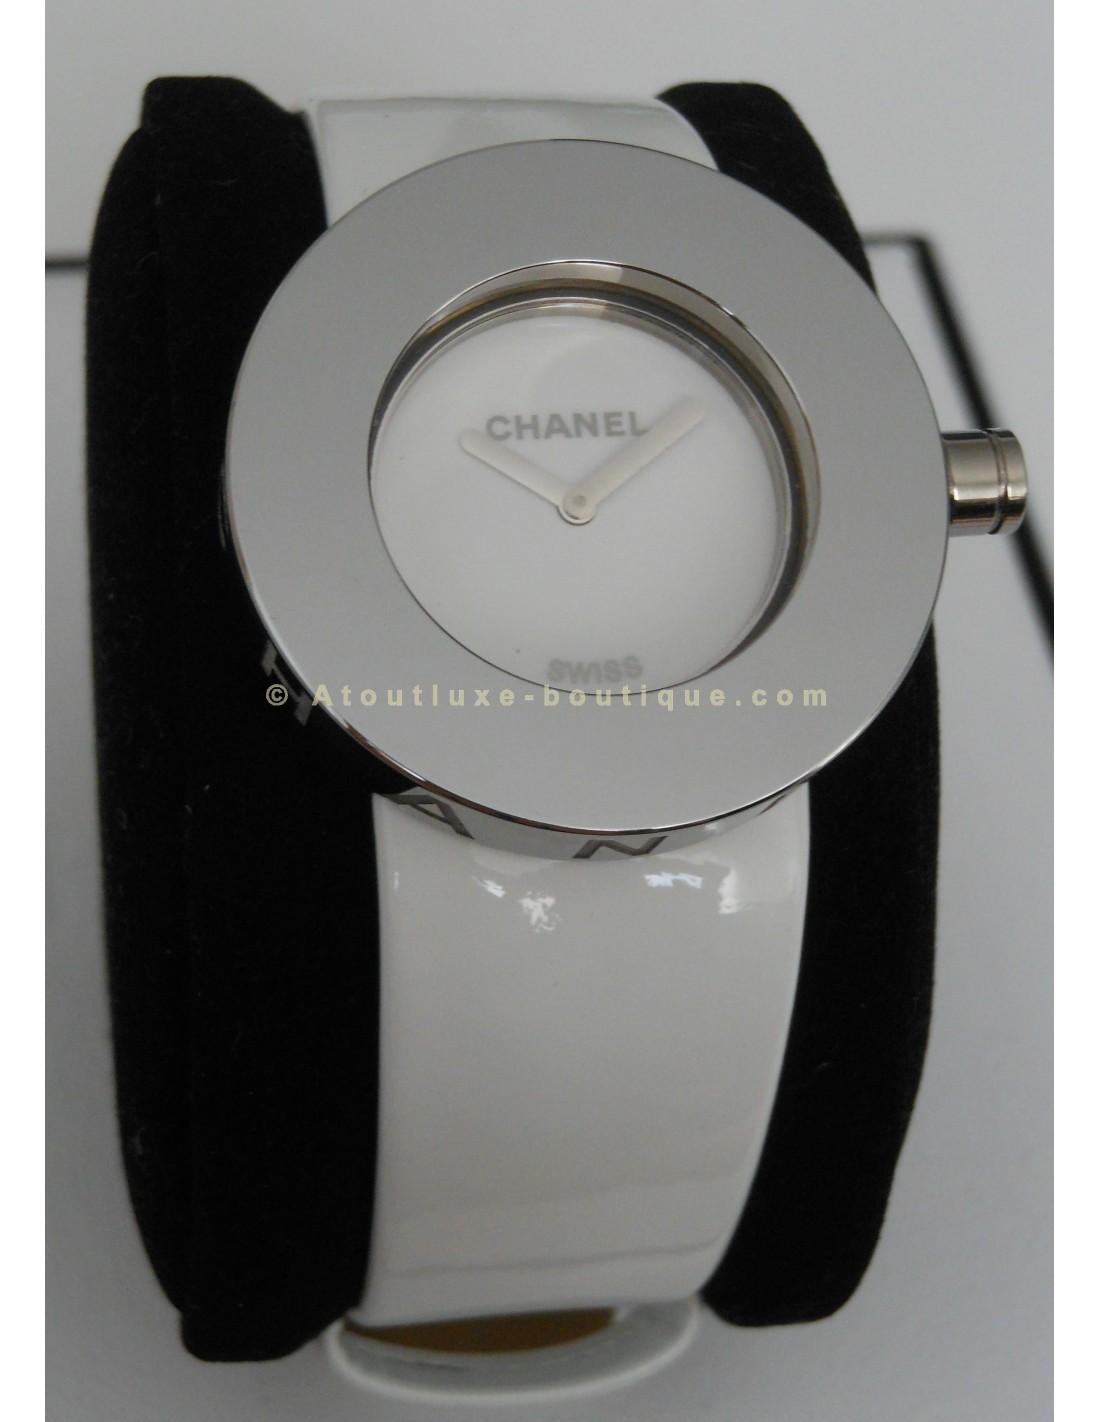 0fcb80fd8e9 MONTRE CHANEL LA RONDE - Atoutluxe Boutique